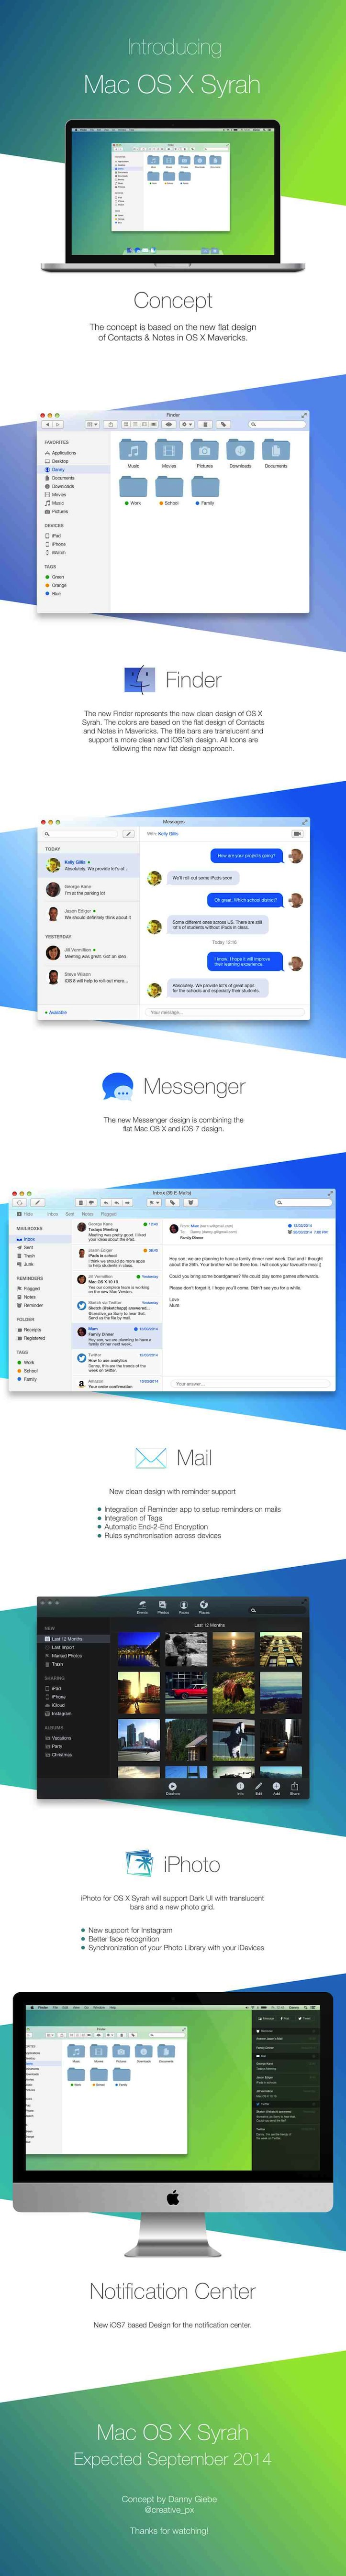 OS X 10.10 Syrah